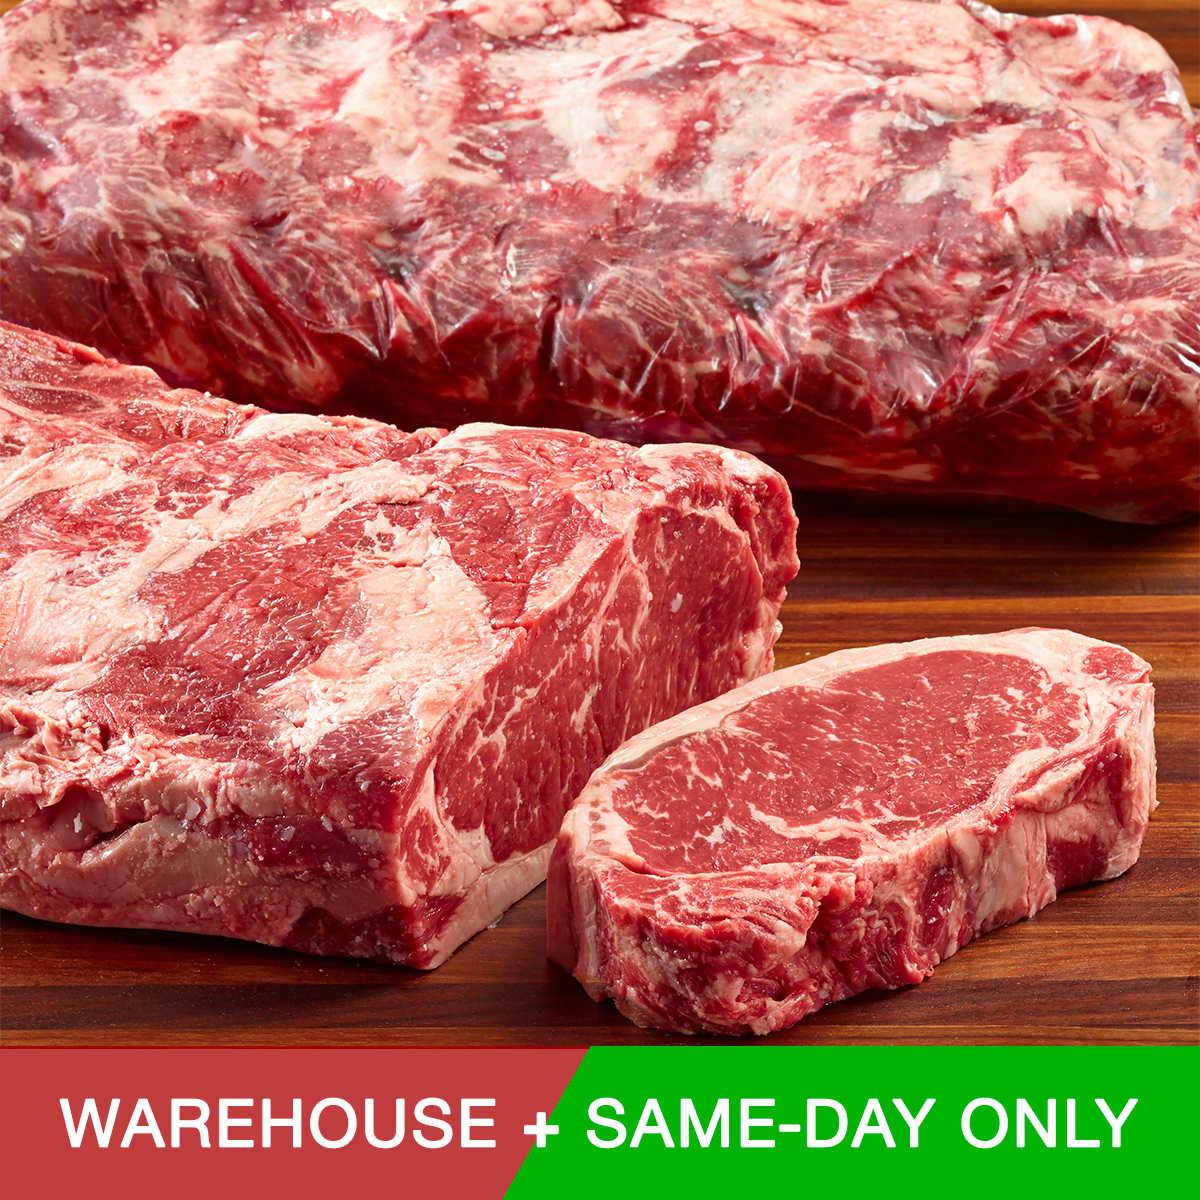 $25 off USDA Prime Beef Loin Whole New York, Costco B&M